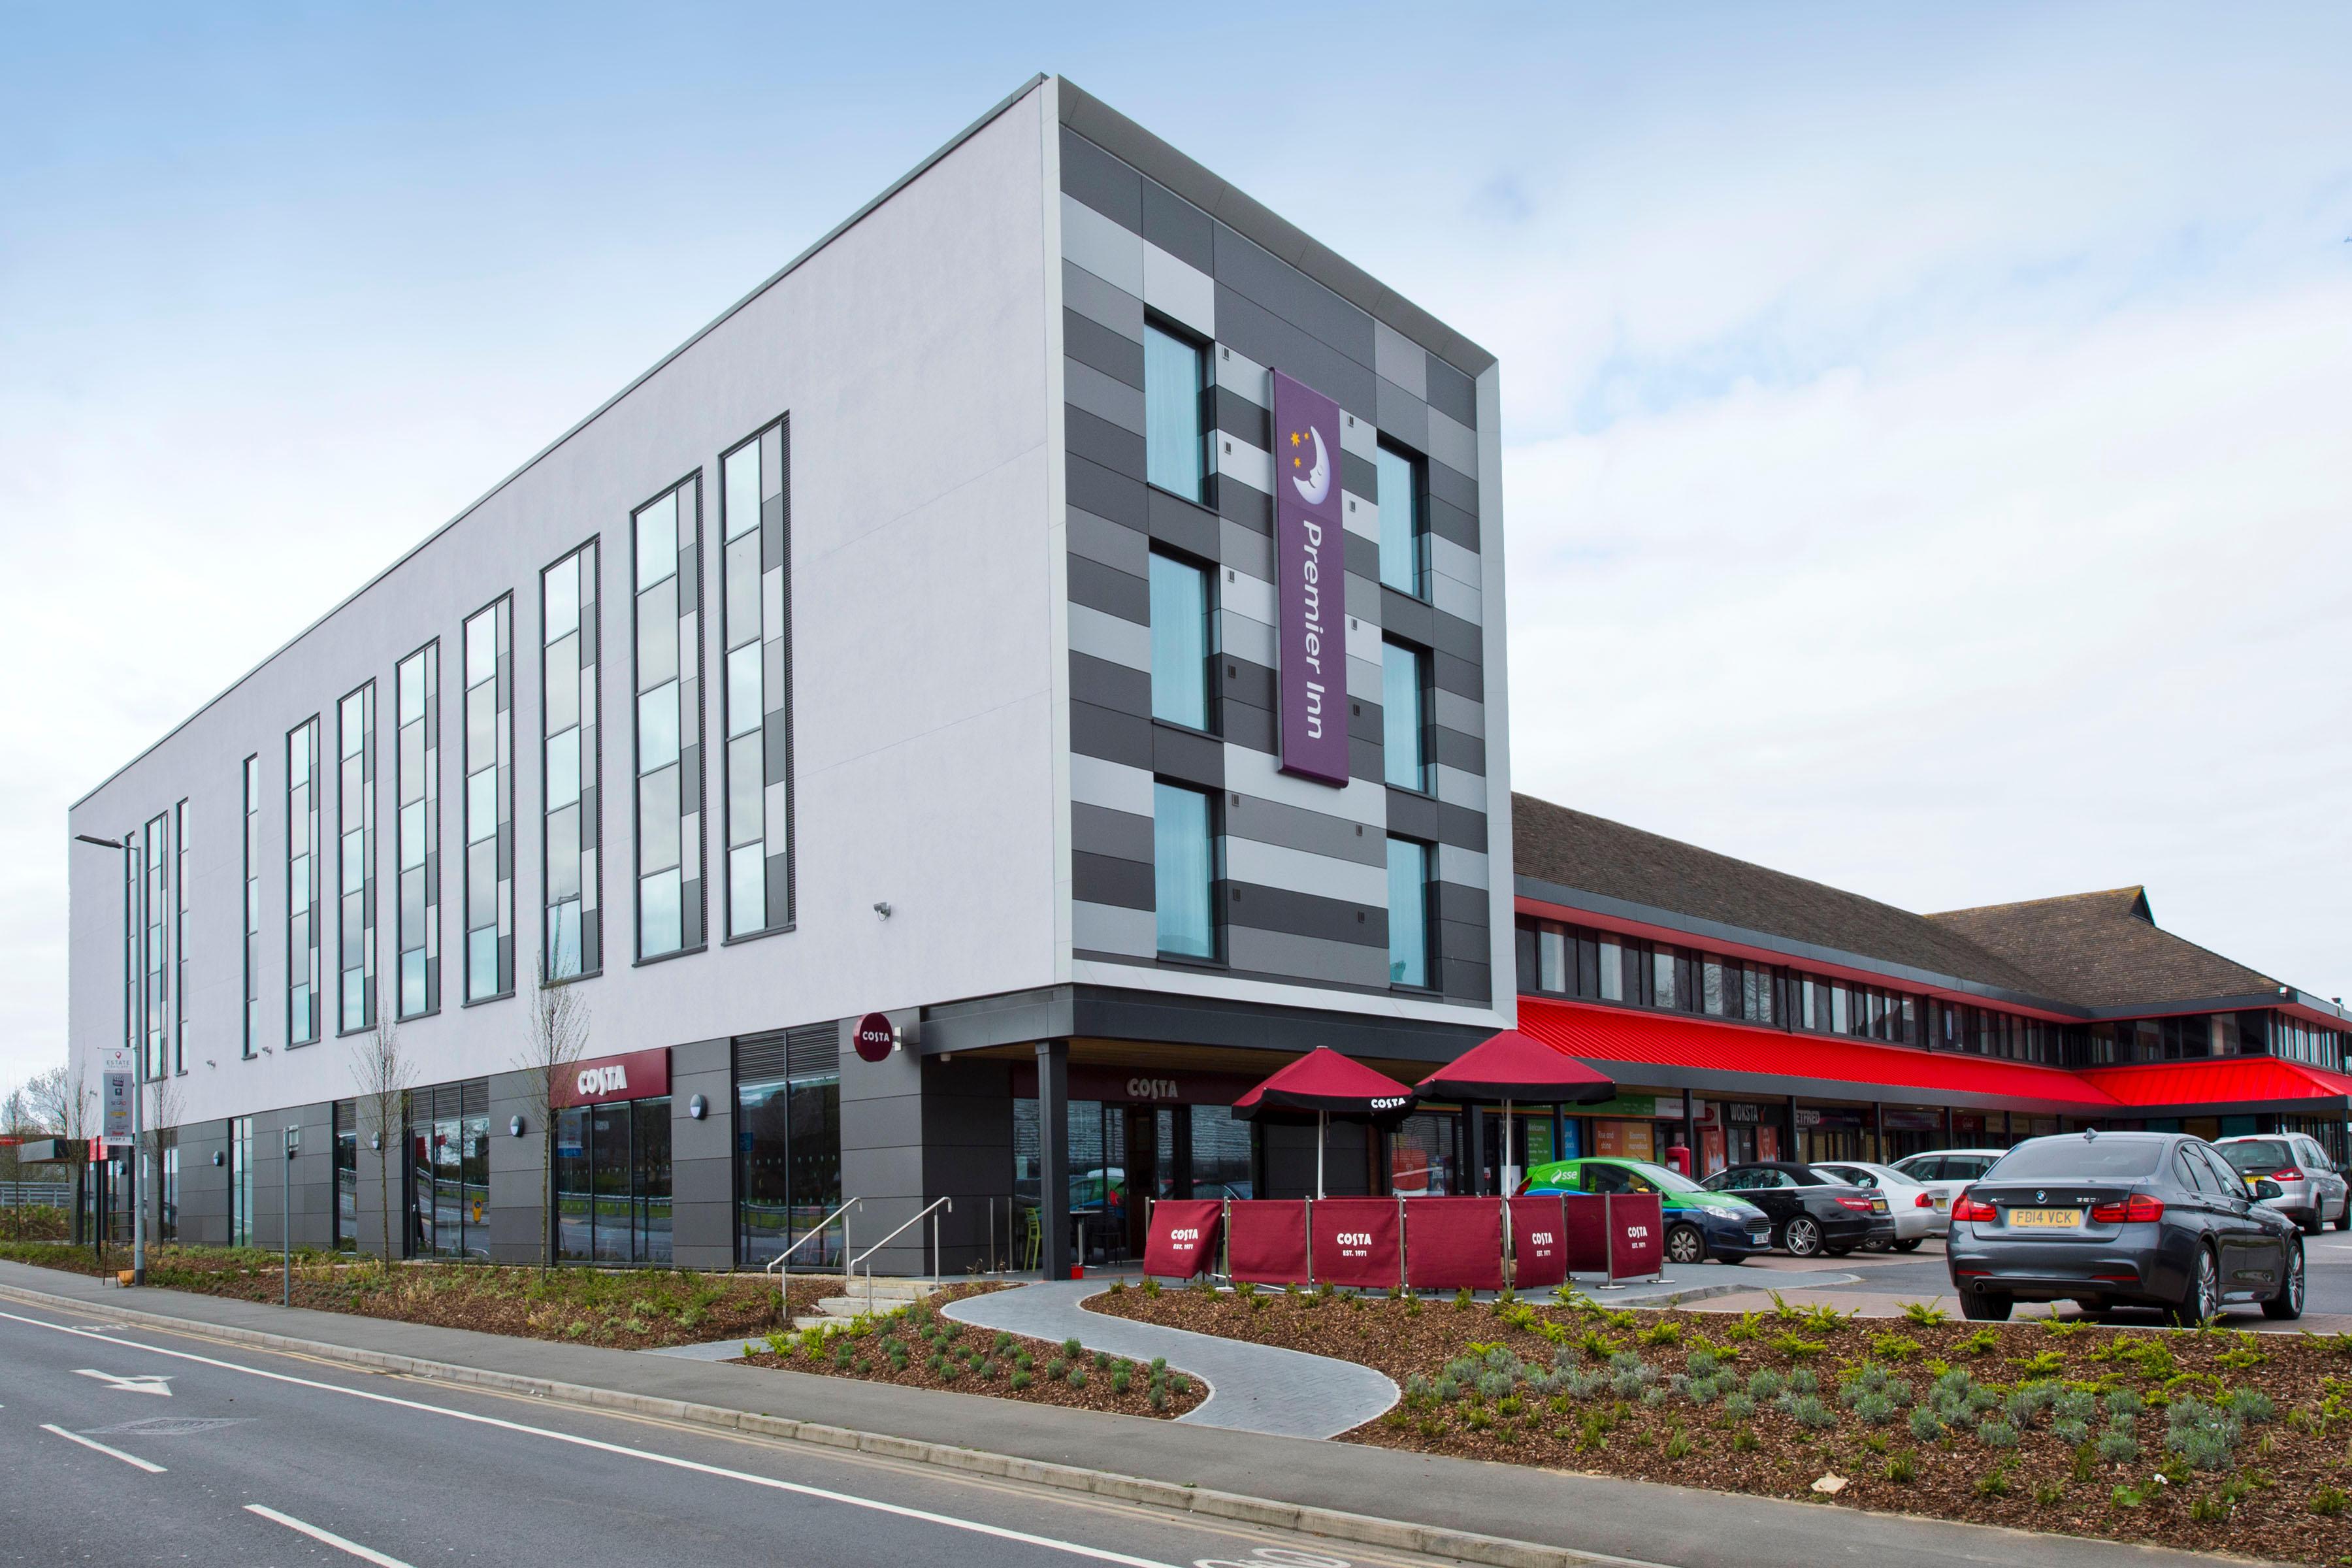 Premier Inn Slough West (Slough Trading Estate) hotel